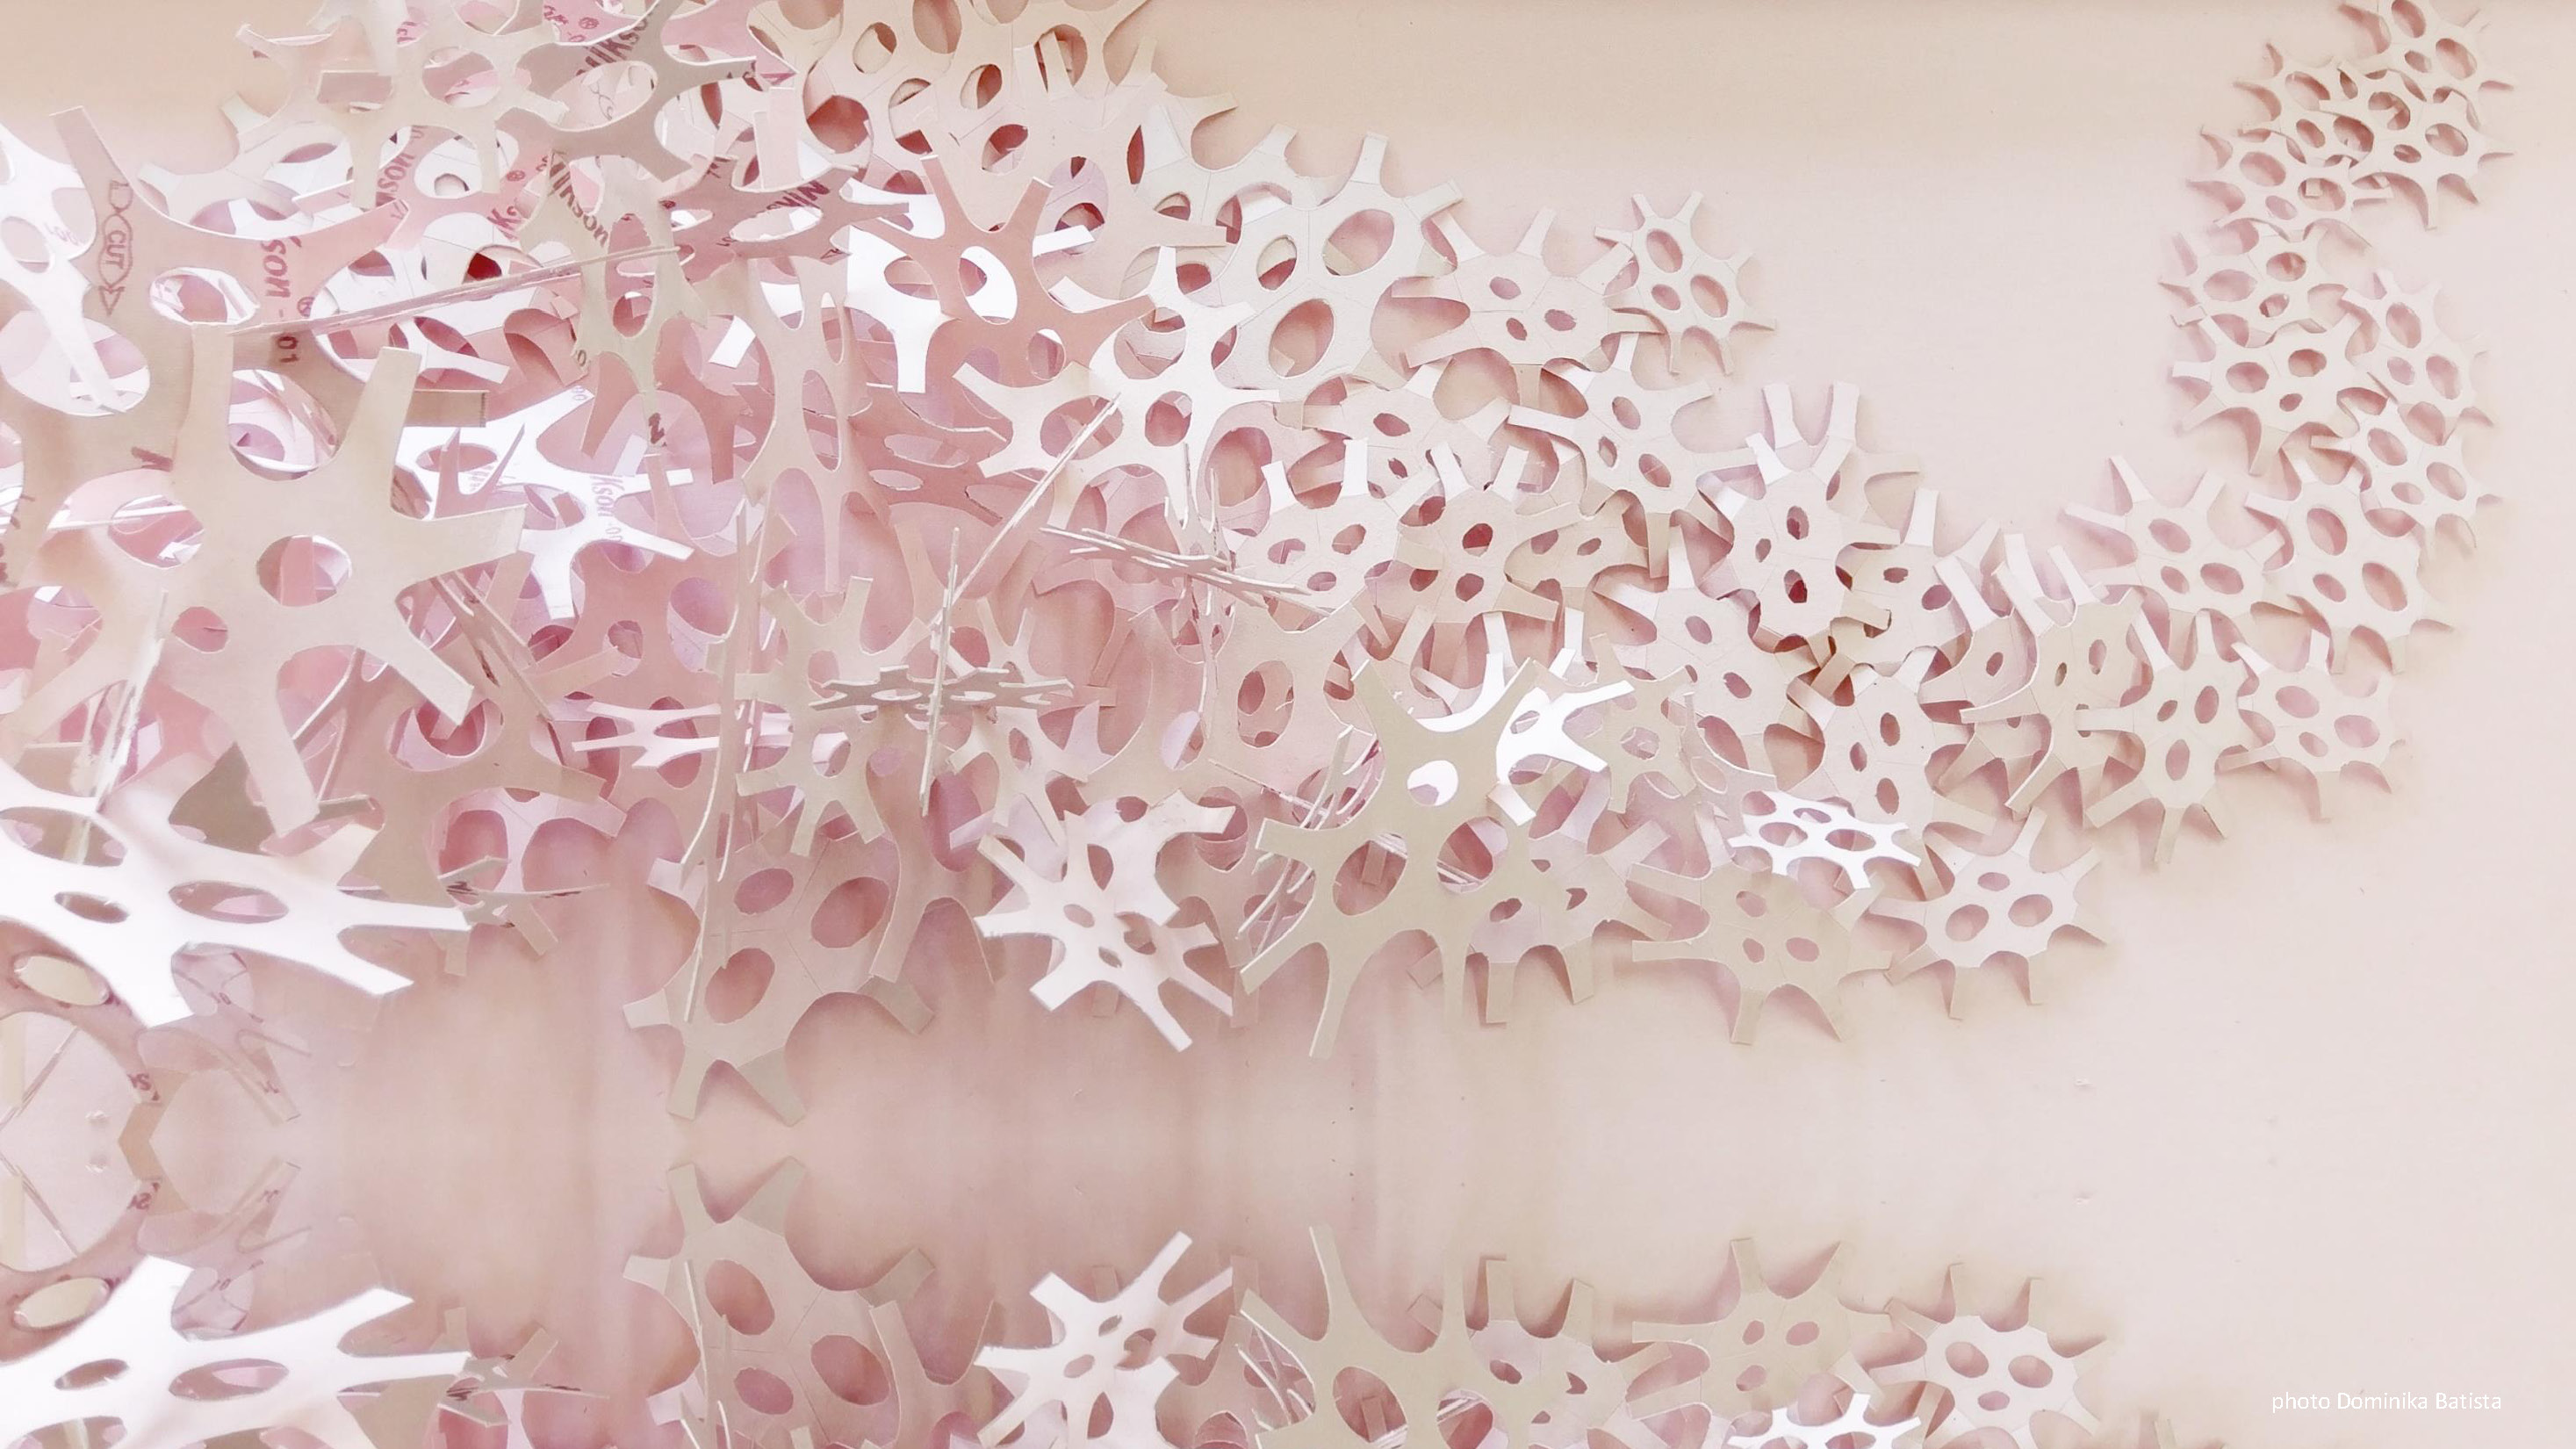 Dominika Batista PhD architectural fabrication